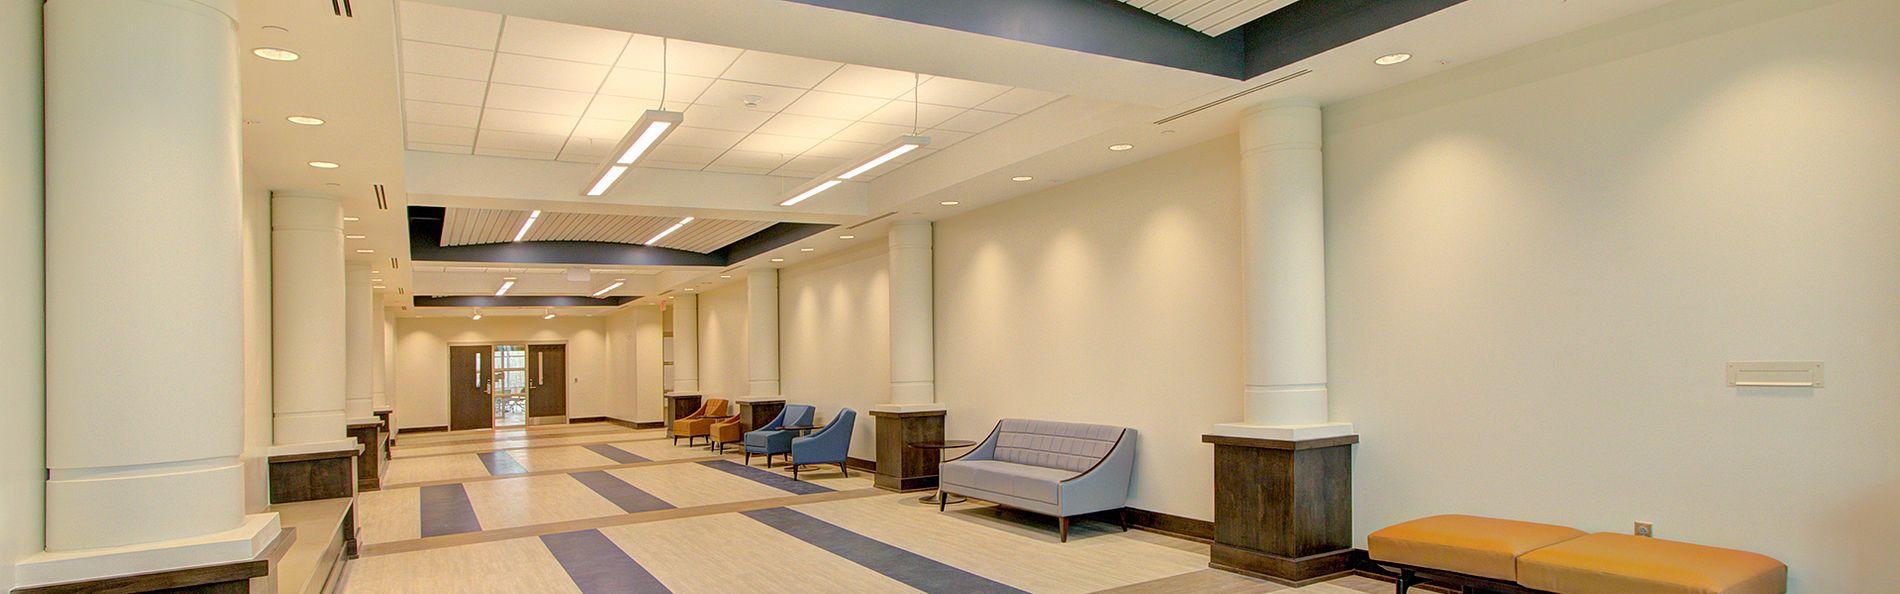 South Piedmont Community College Multi-Purpose Stem Building